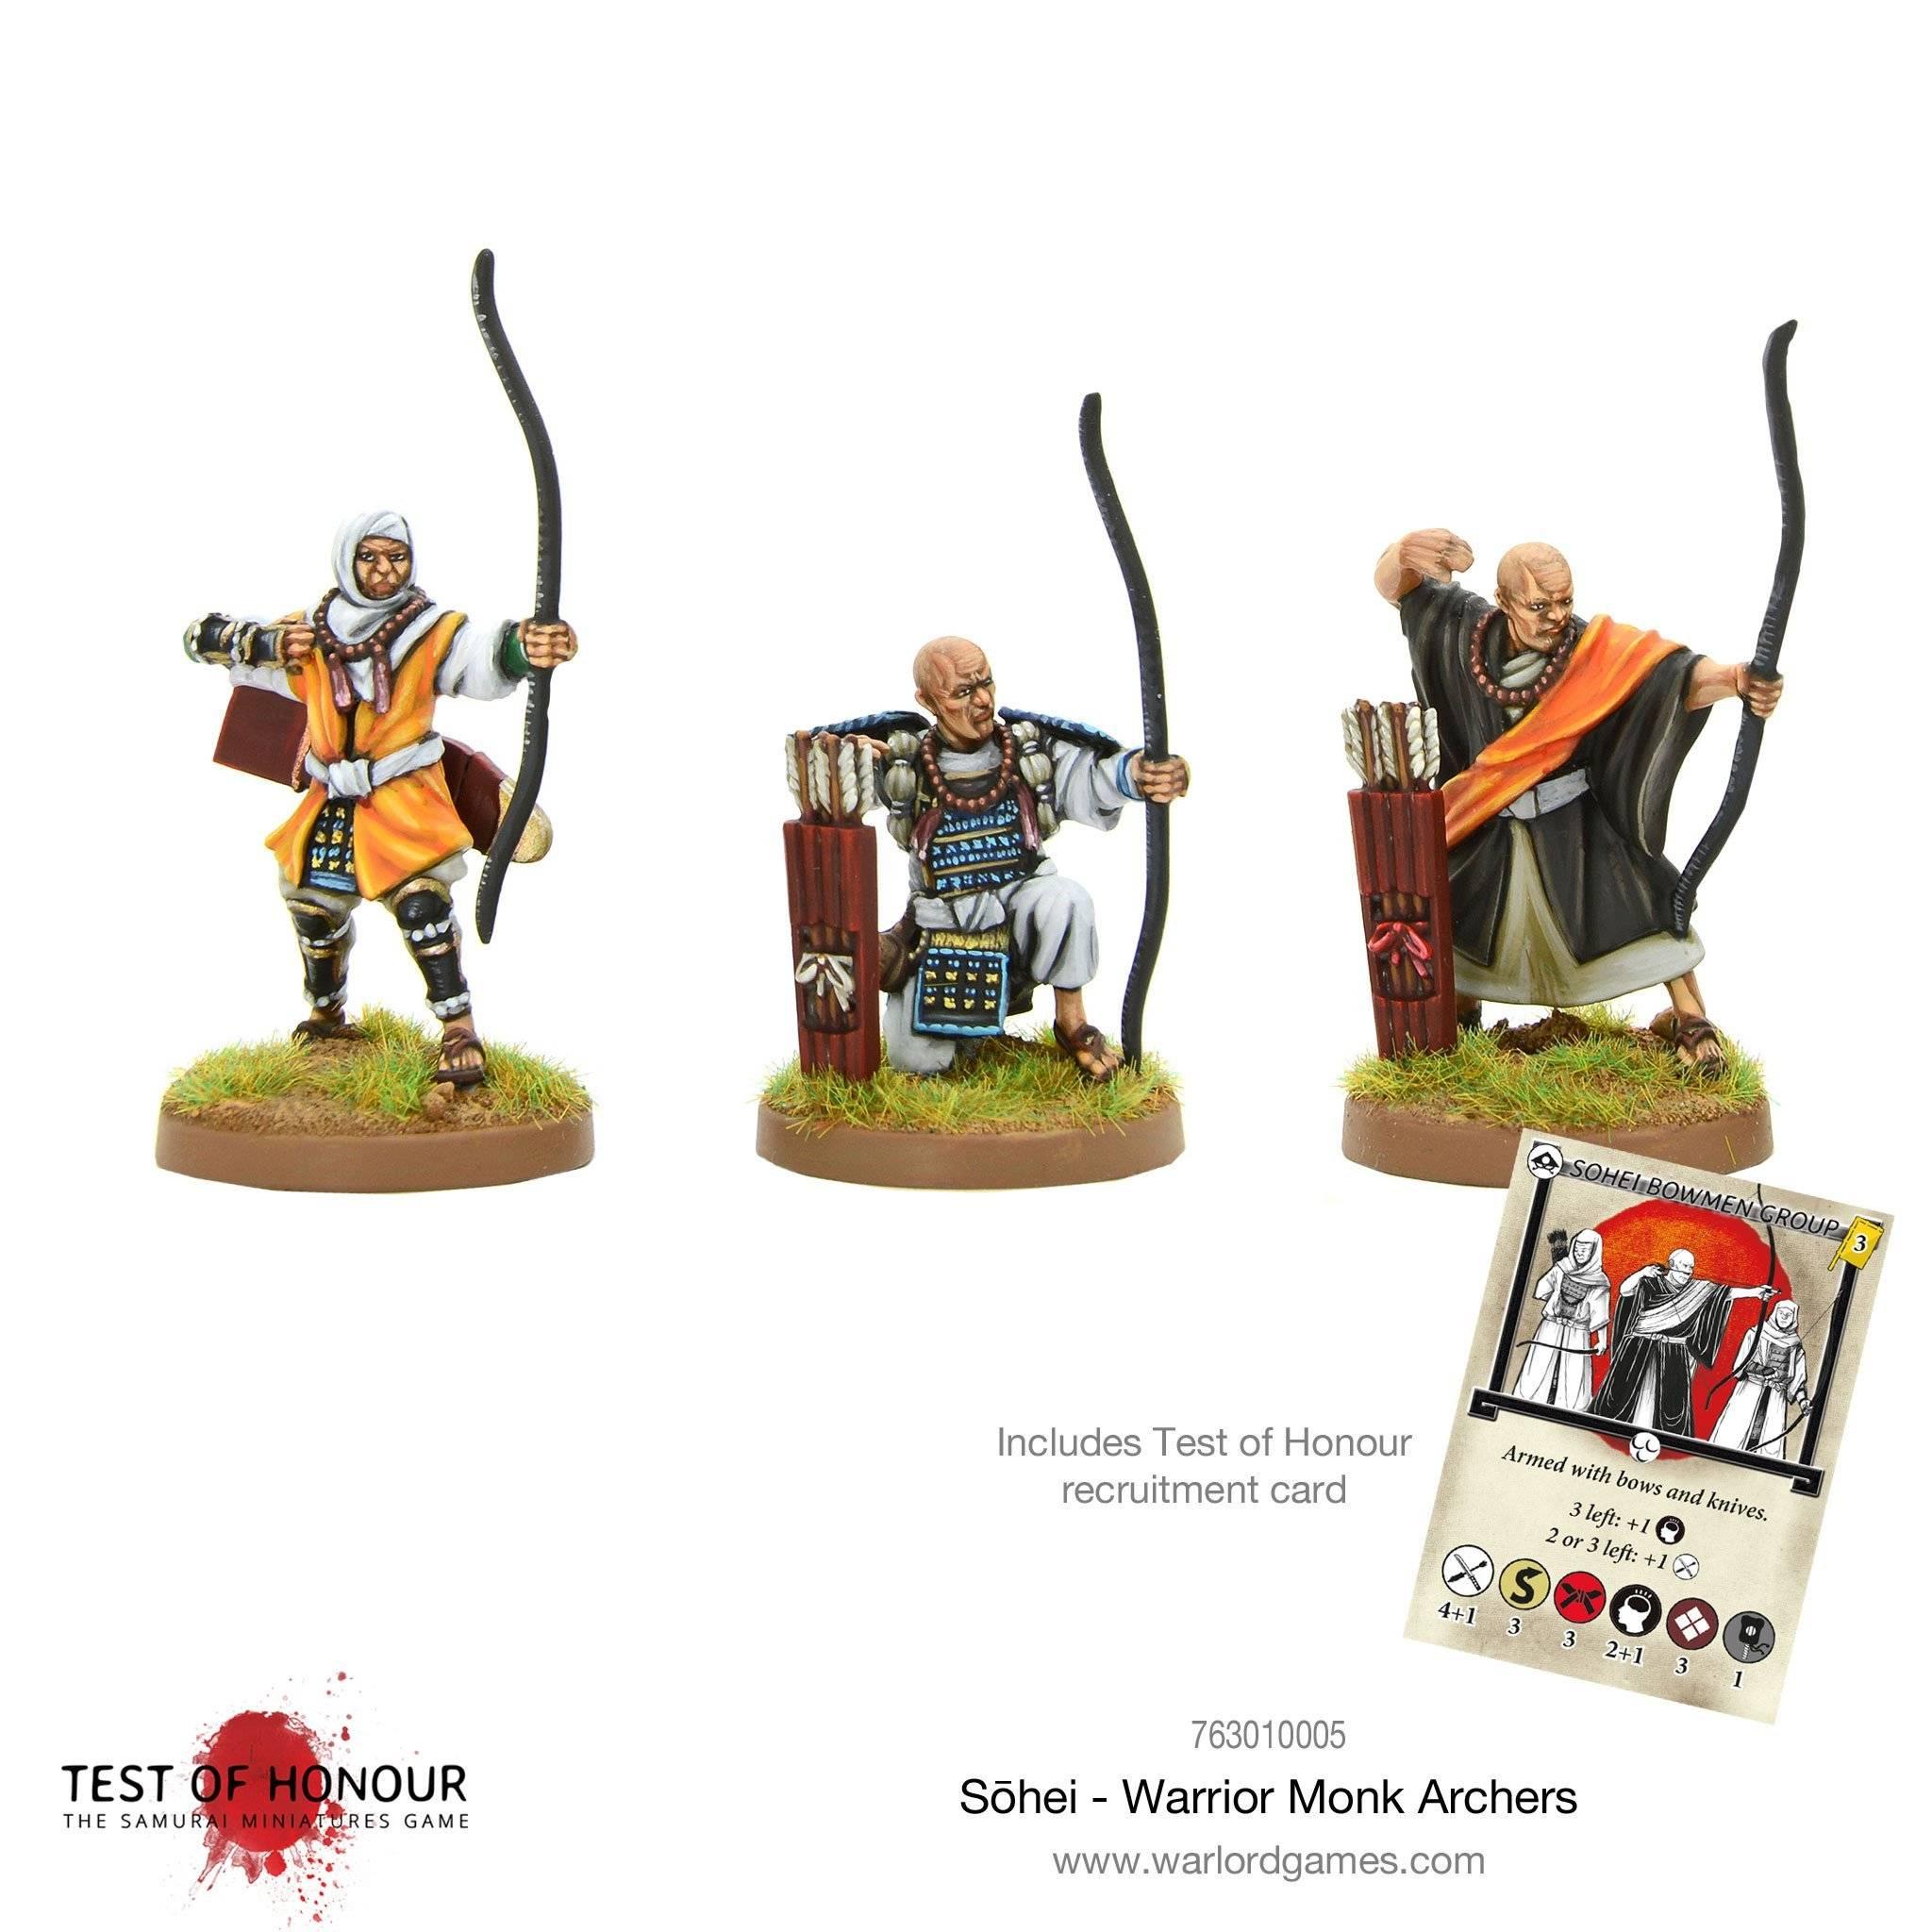 Test of Honour - Sohei warrior monk archers